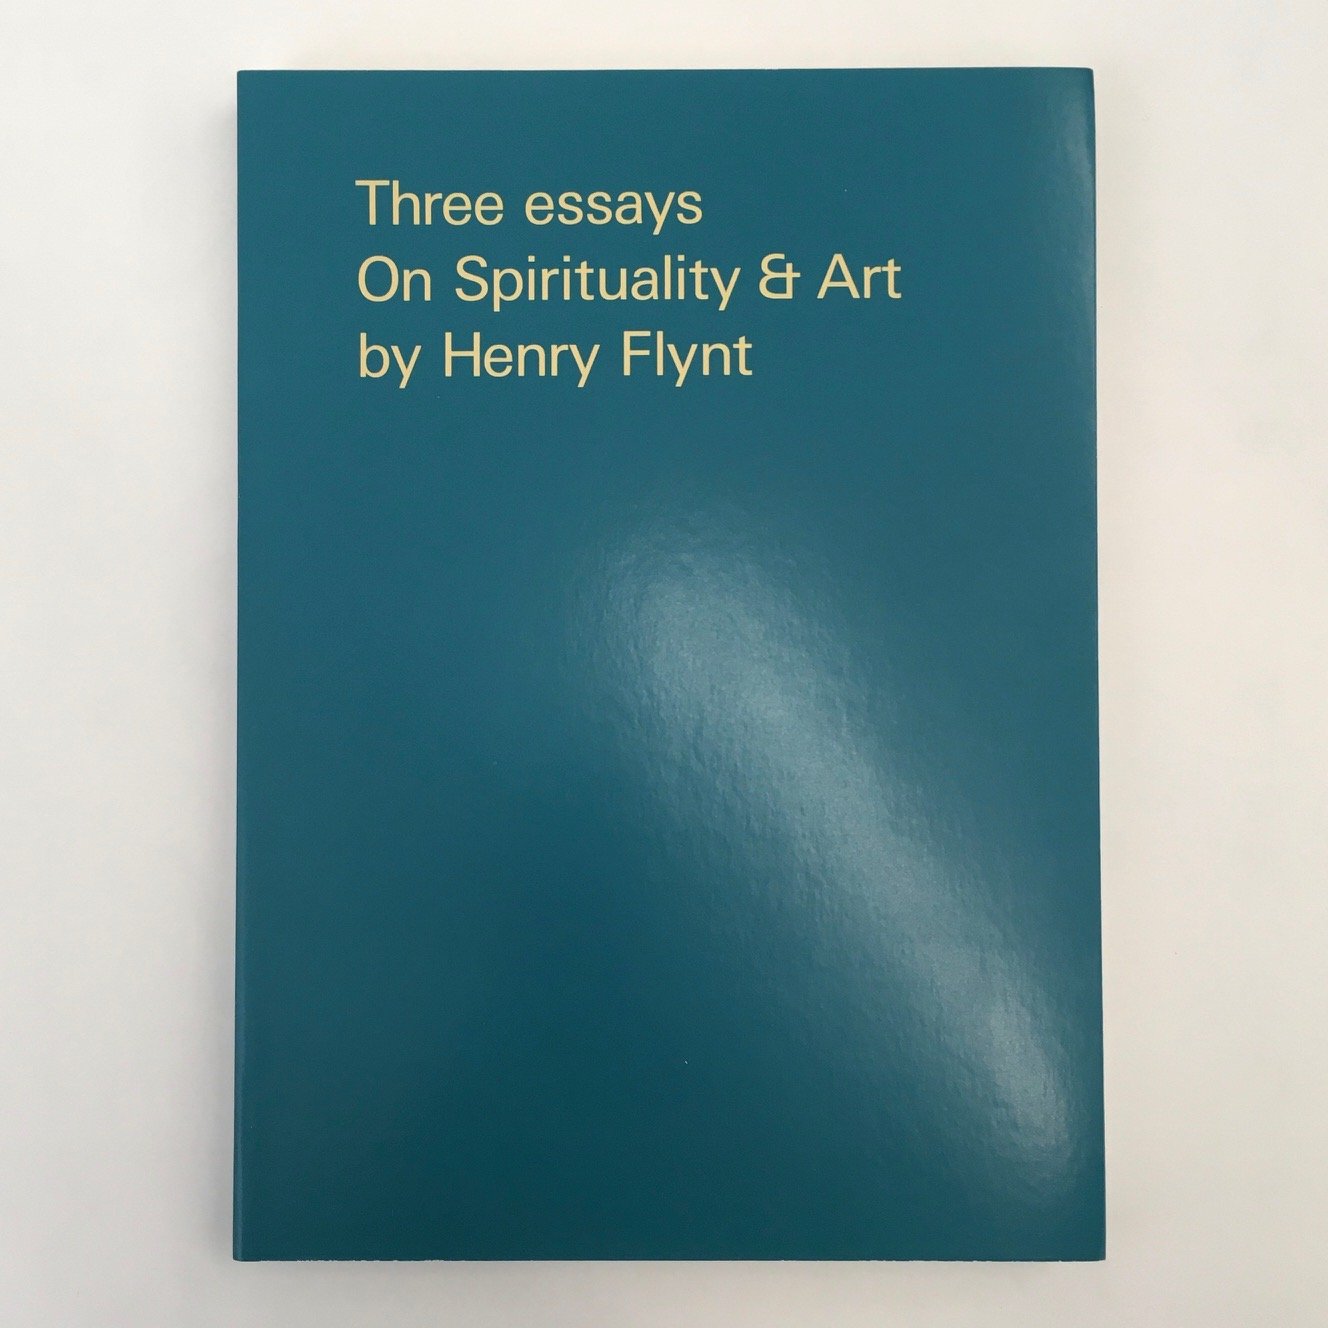 Three Essays On Spirituality & Art